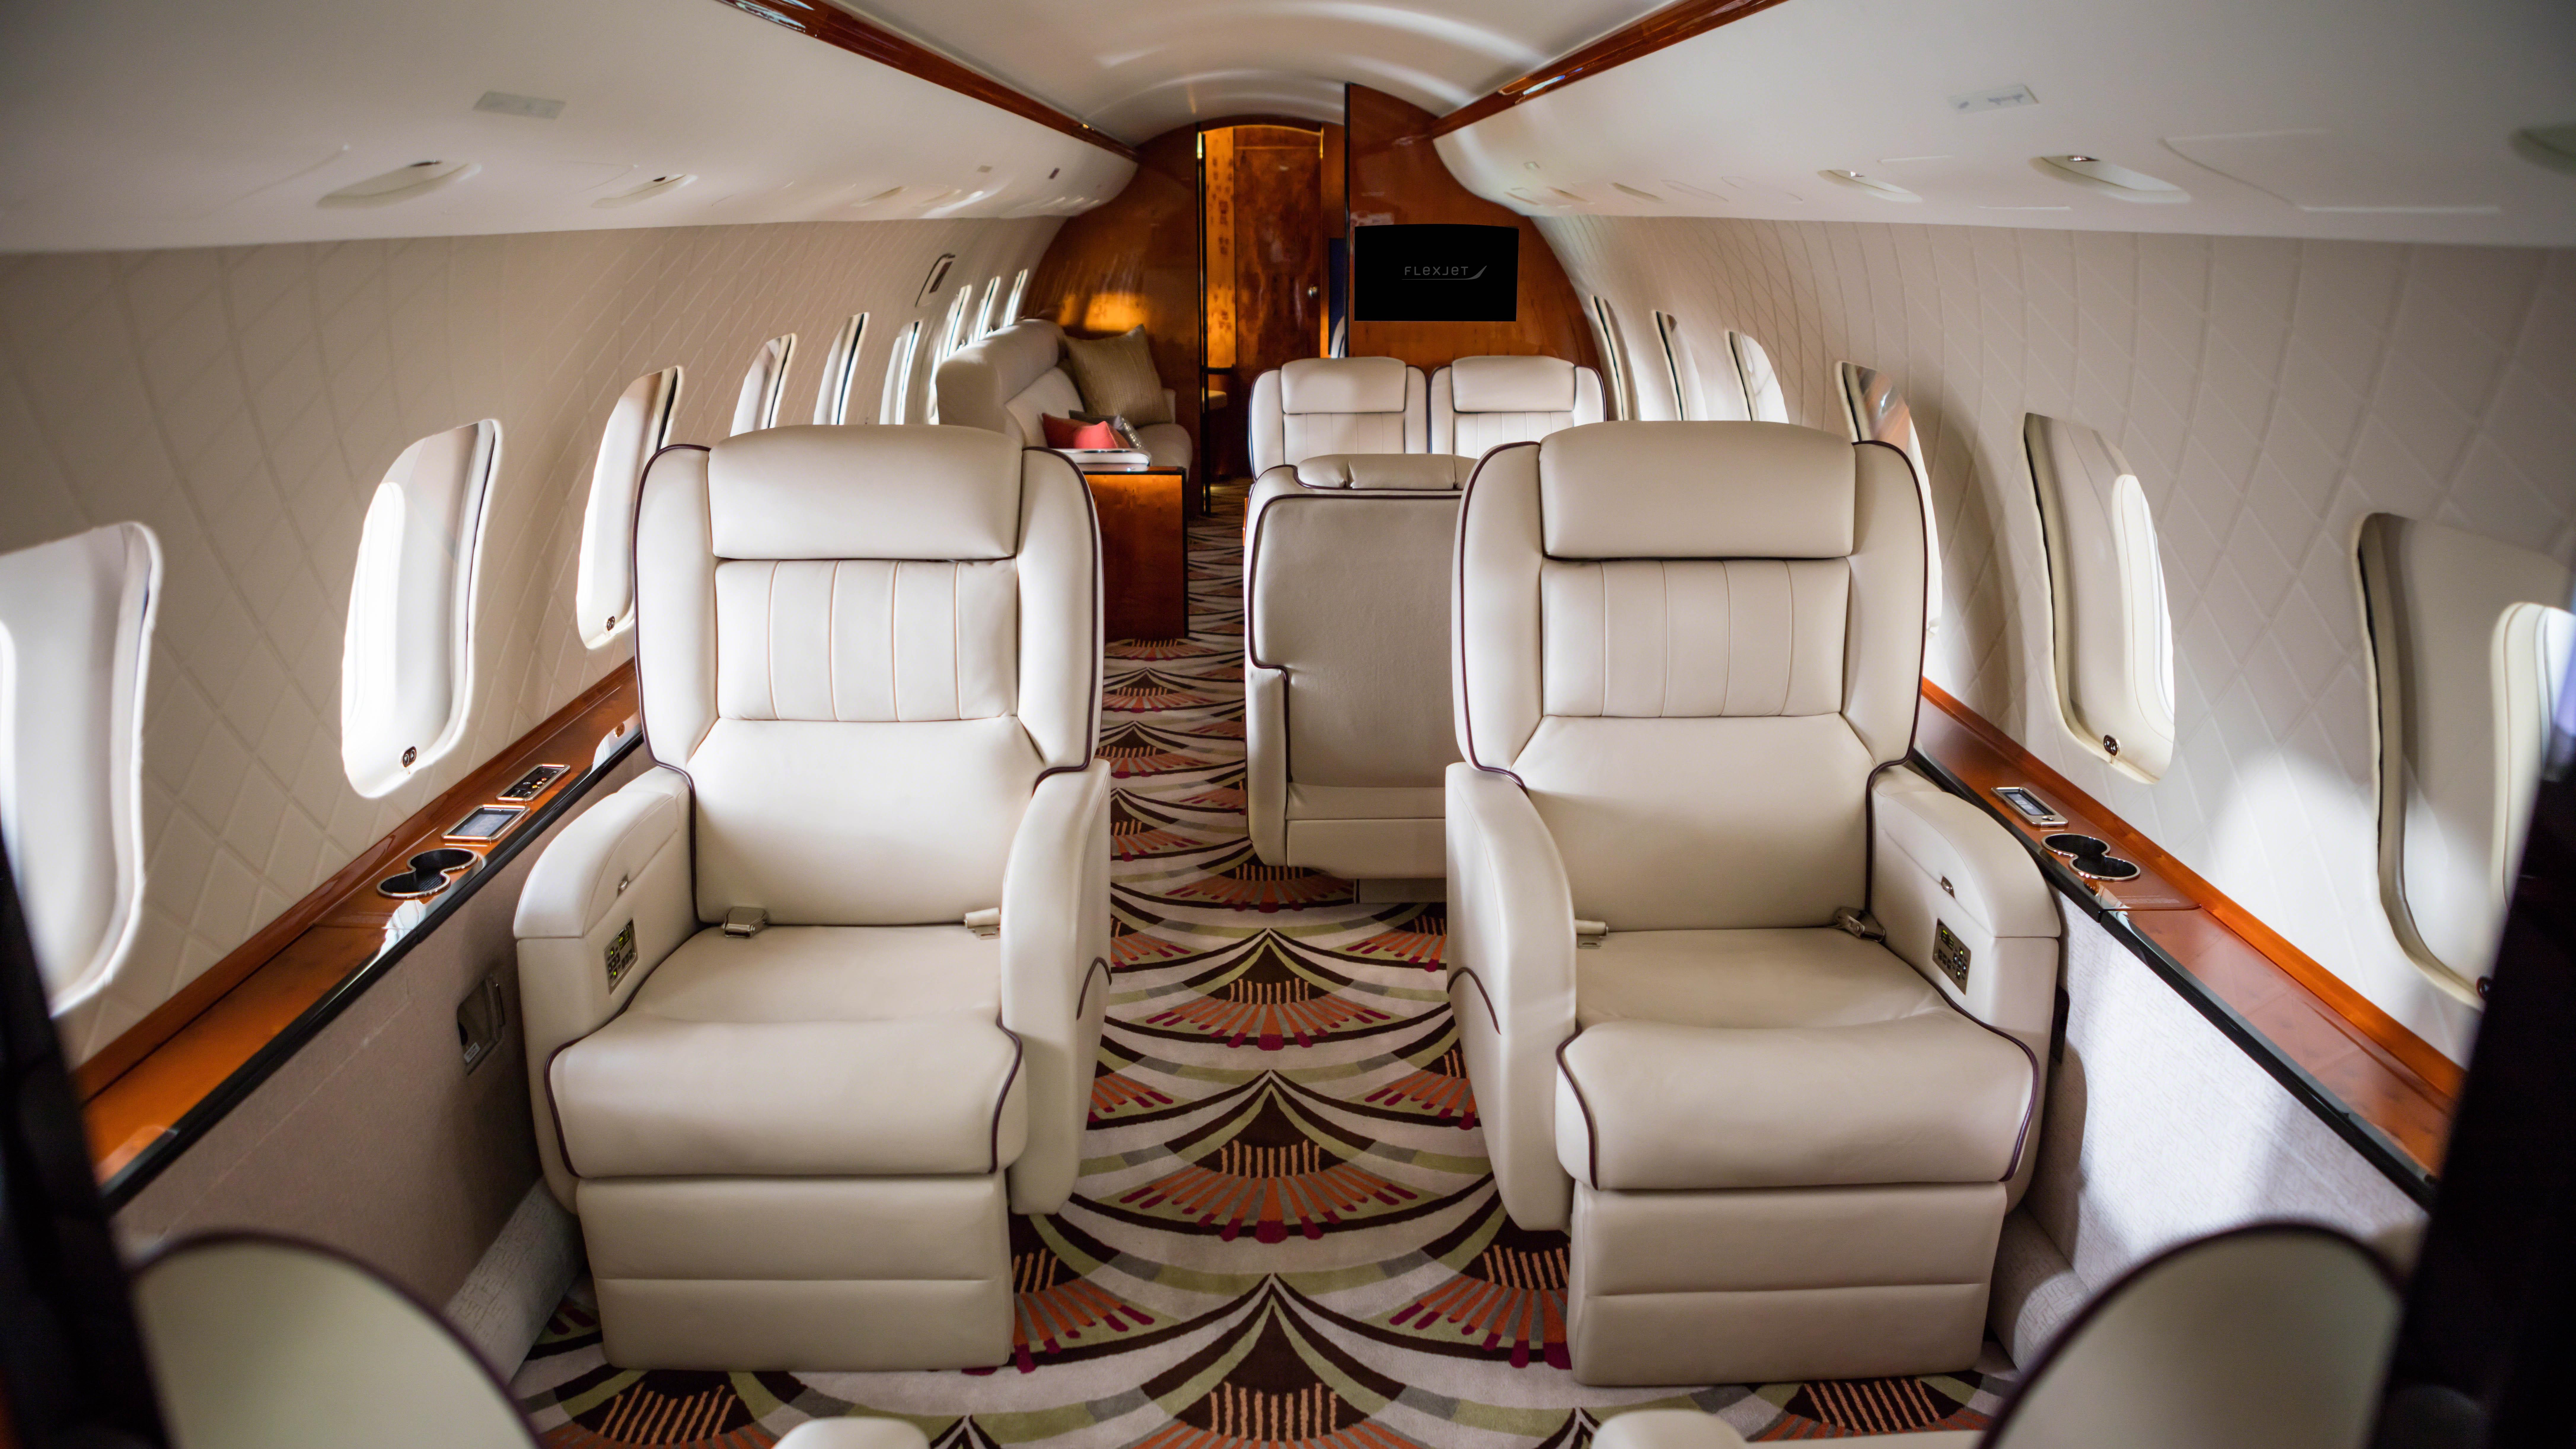 Flexjet Bombardier Global business jet private aviation